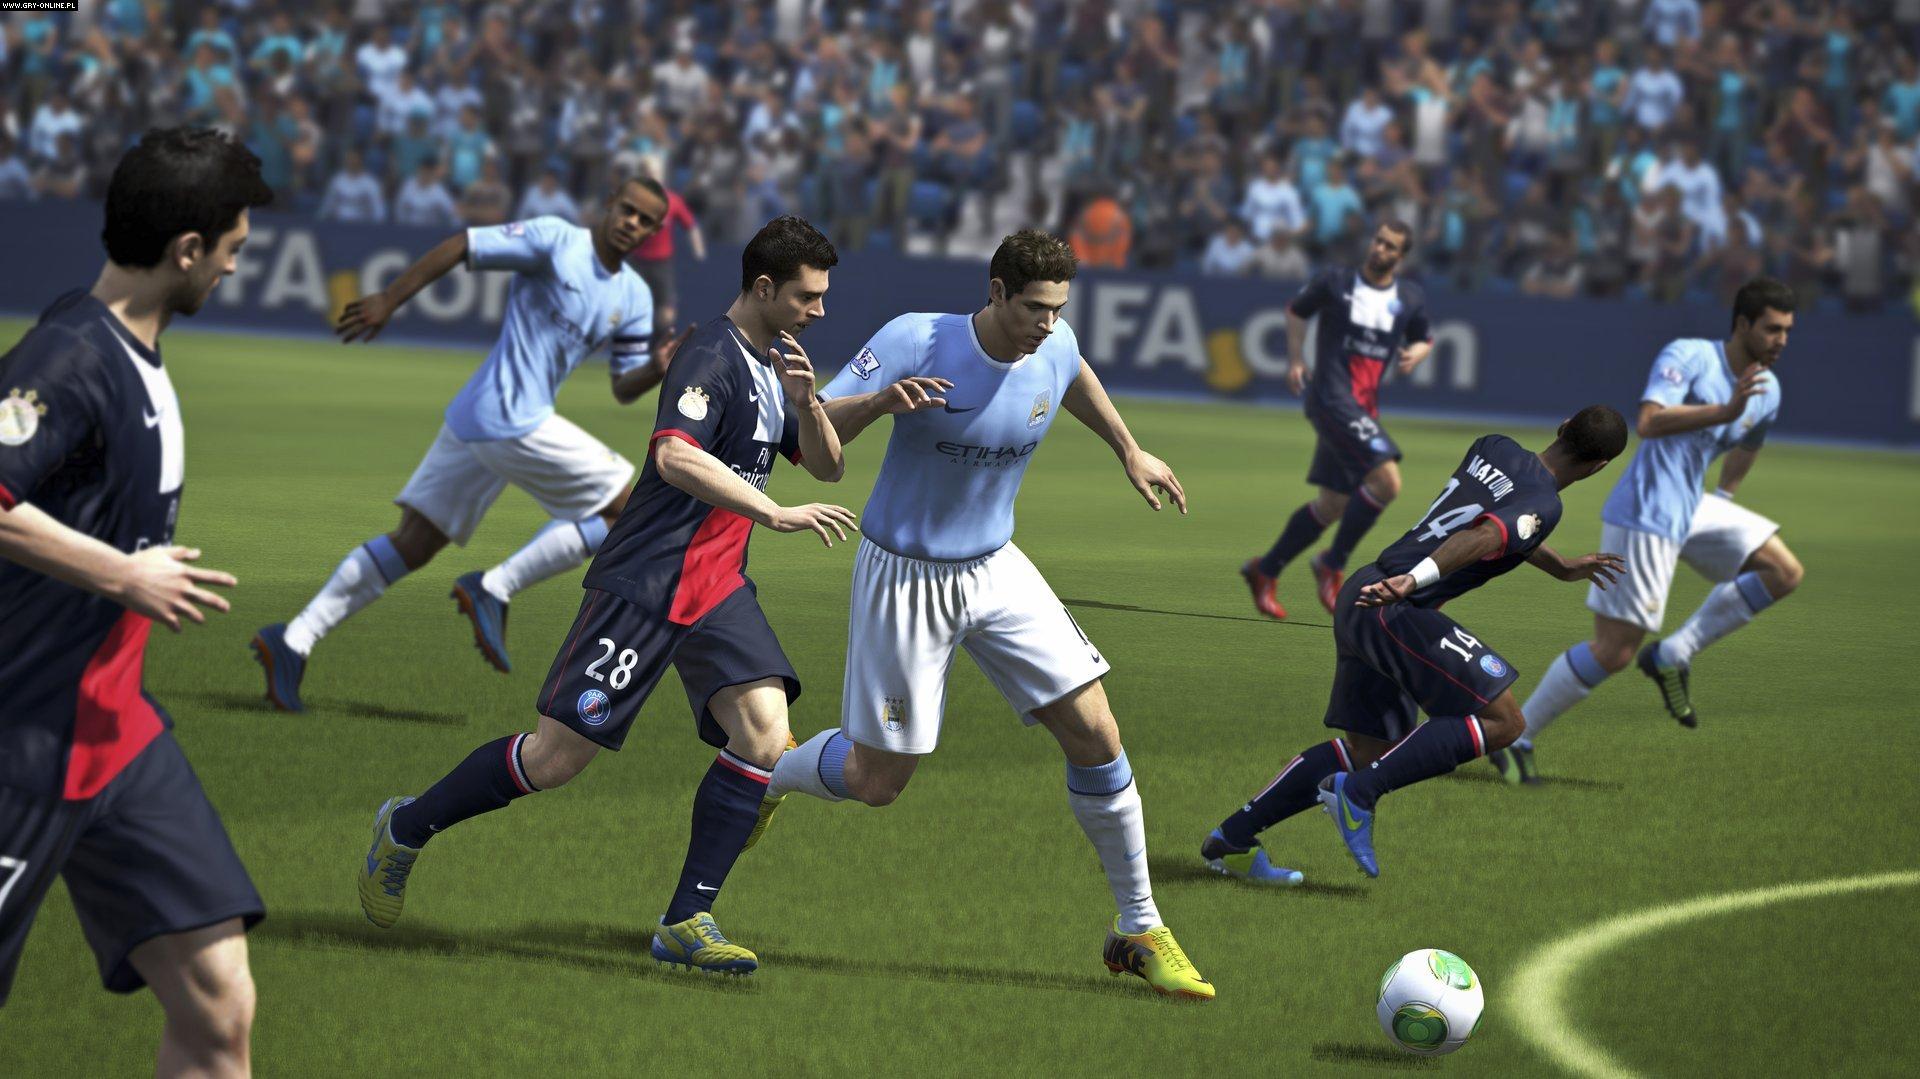 Sports Games For Ps4 : Fifa screenshots gallery screenshot